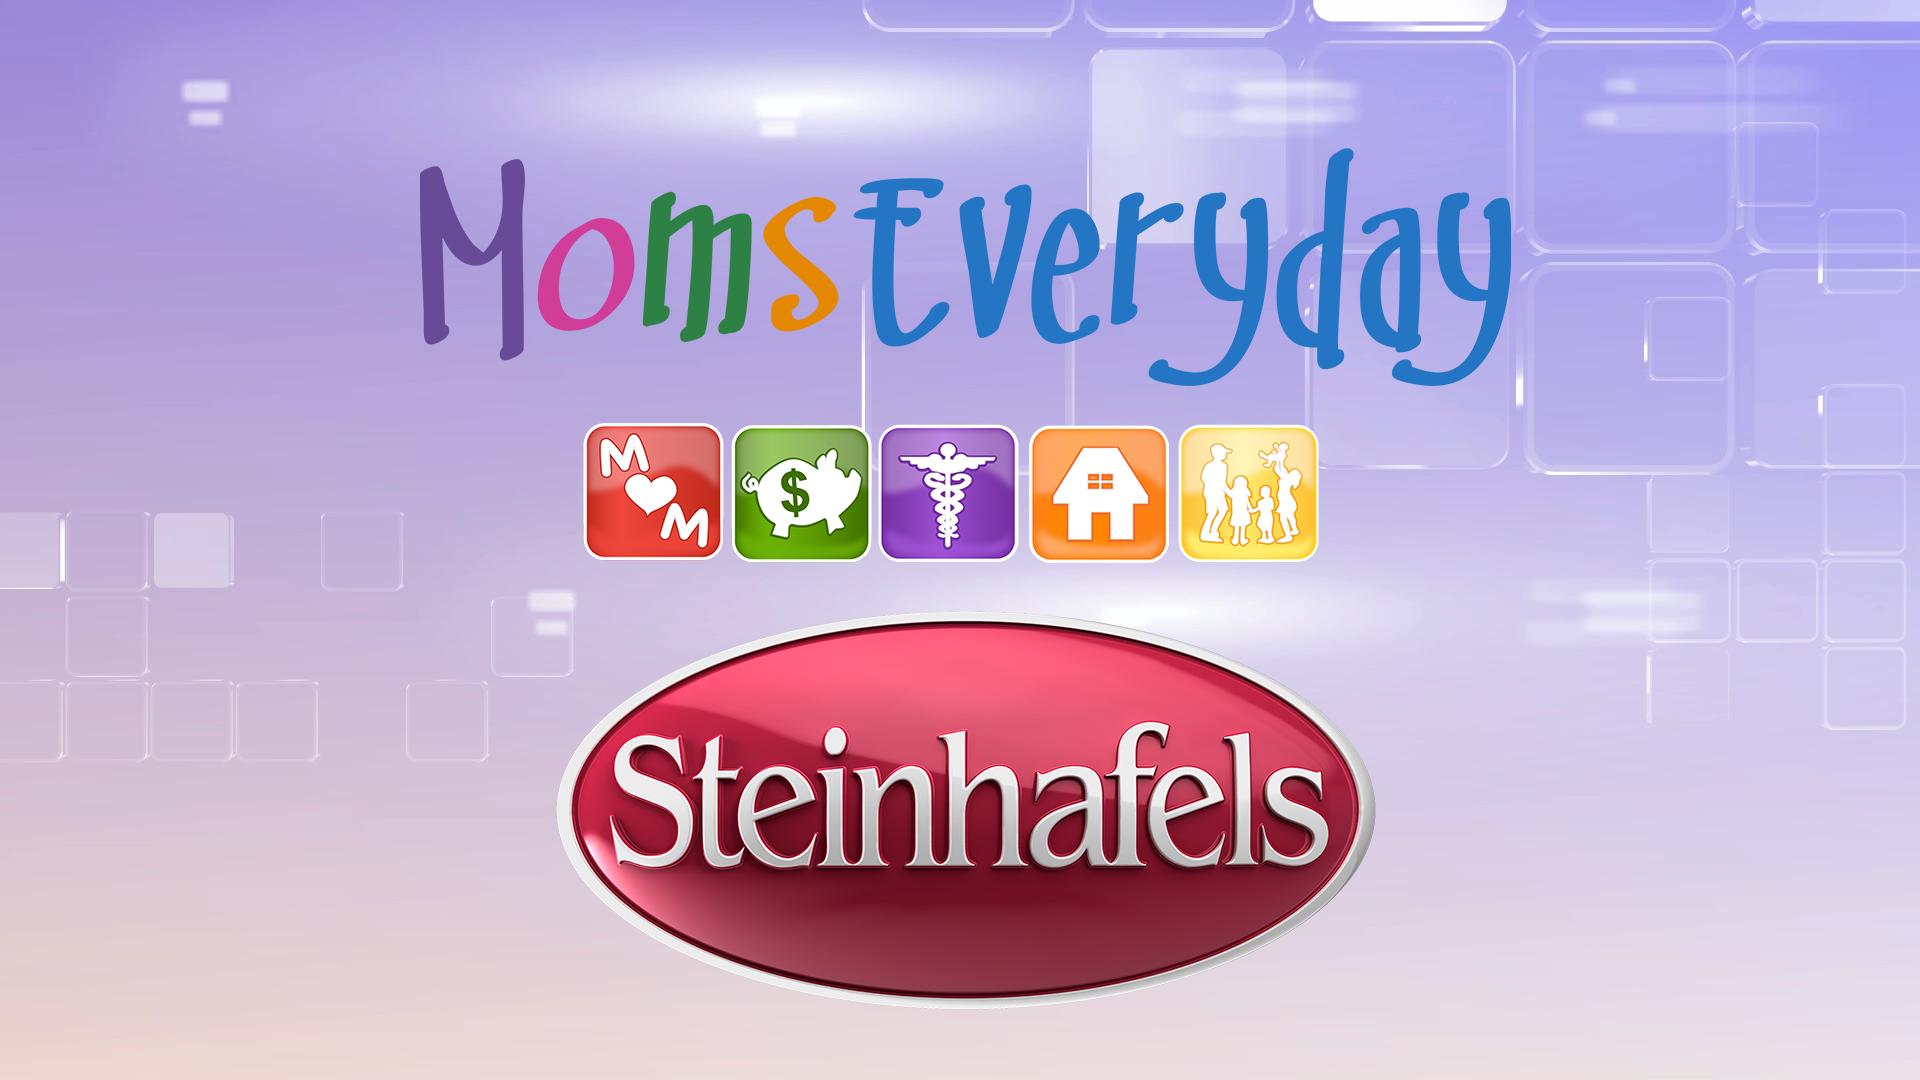 Steinhafels: Memory Foam Vs. Coils